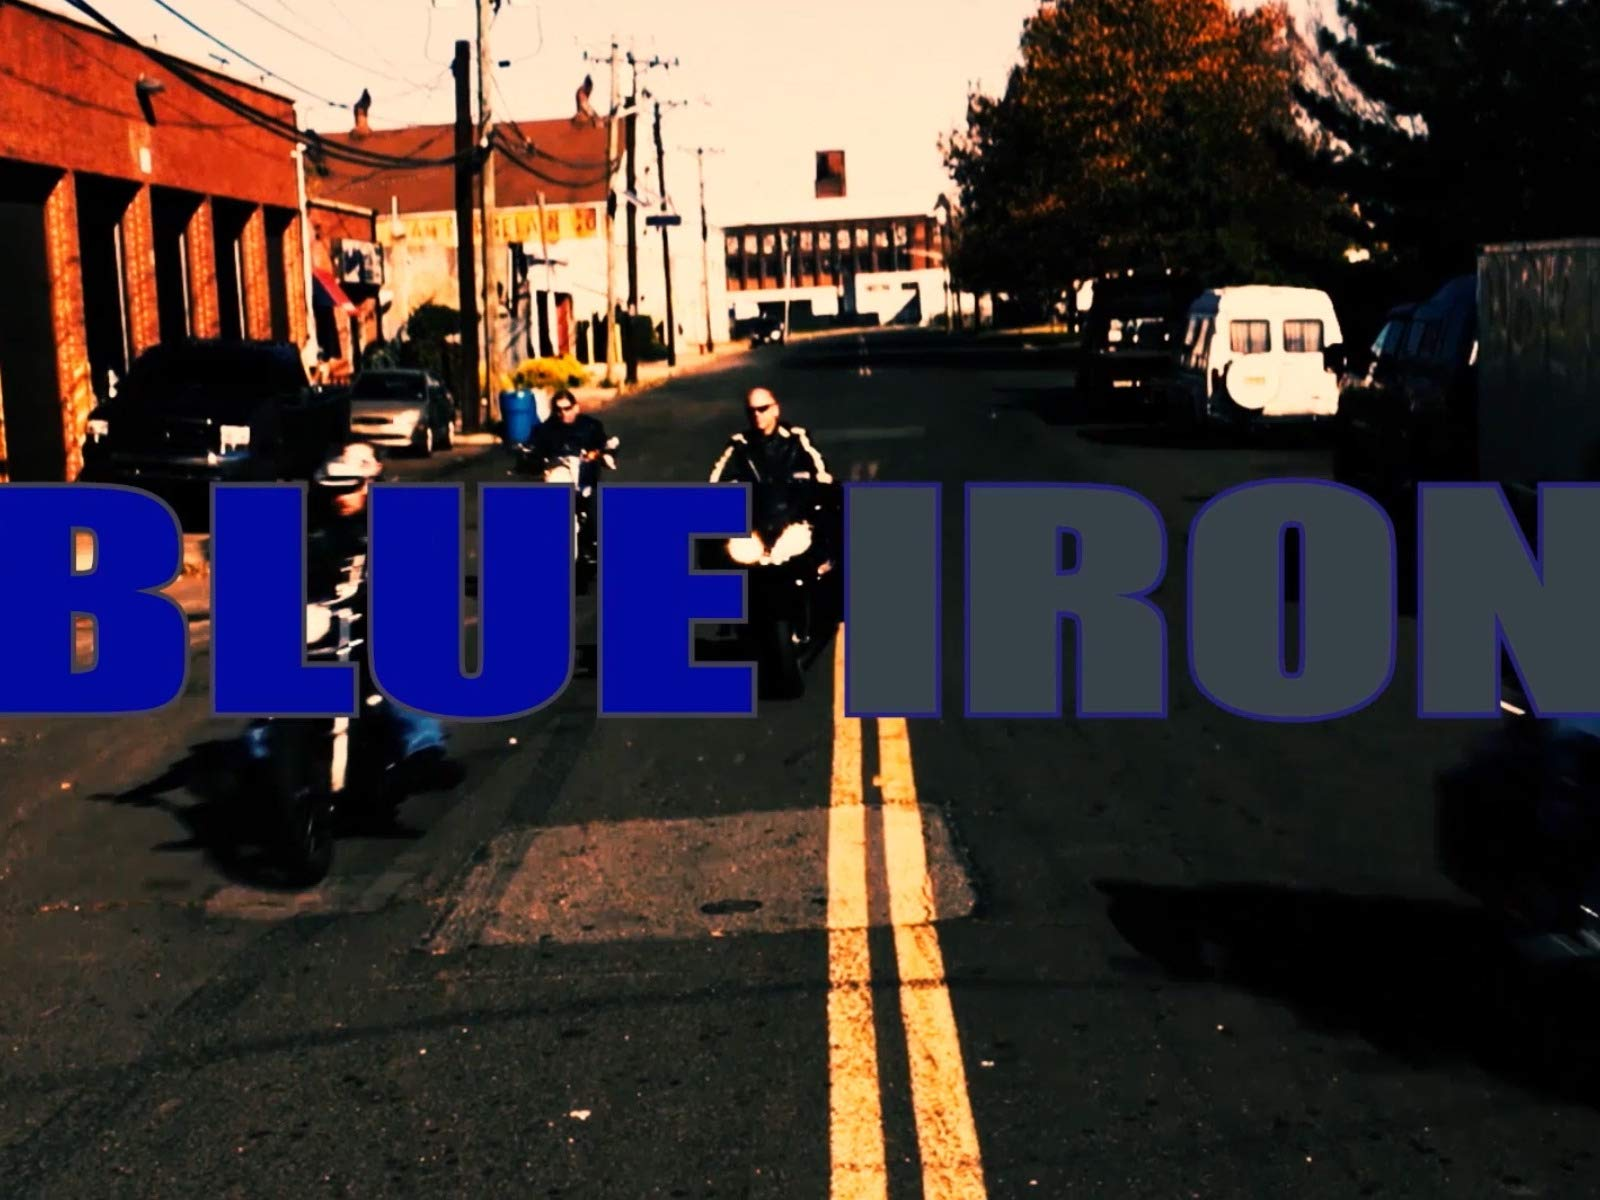 Blue Iron - Season 1